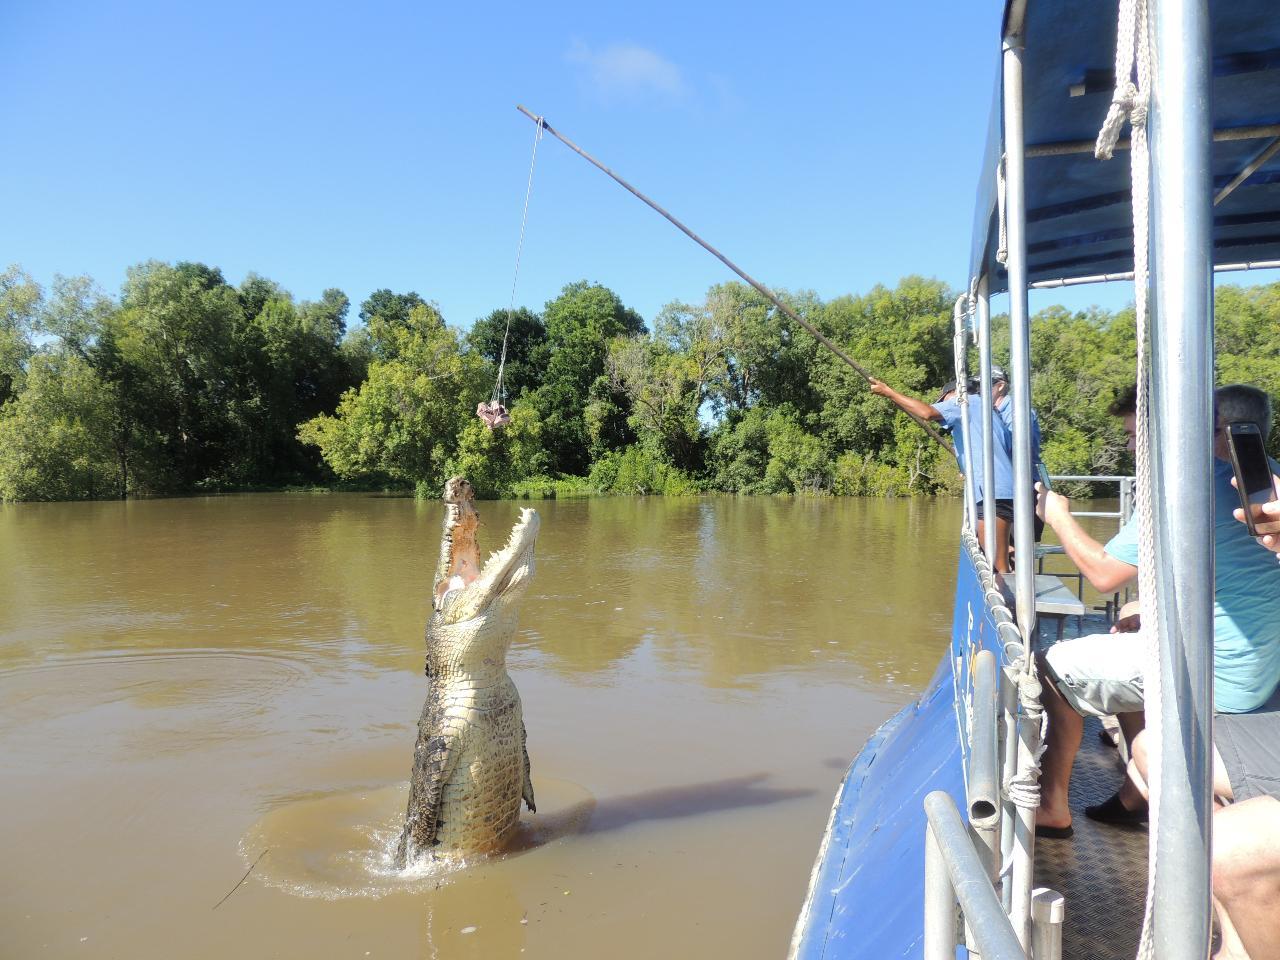 1. Jumping Crocodile Cruise - 1 hour